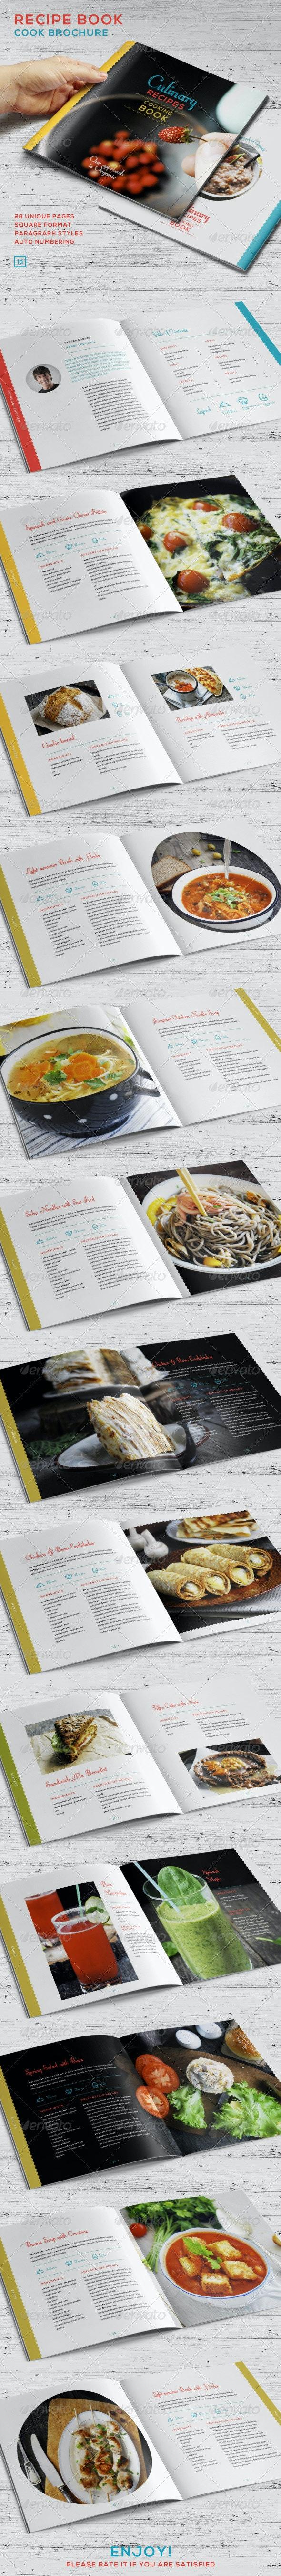 Recipe Book - Cook Brochure - Brochures Print Templates